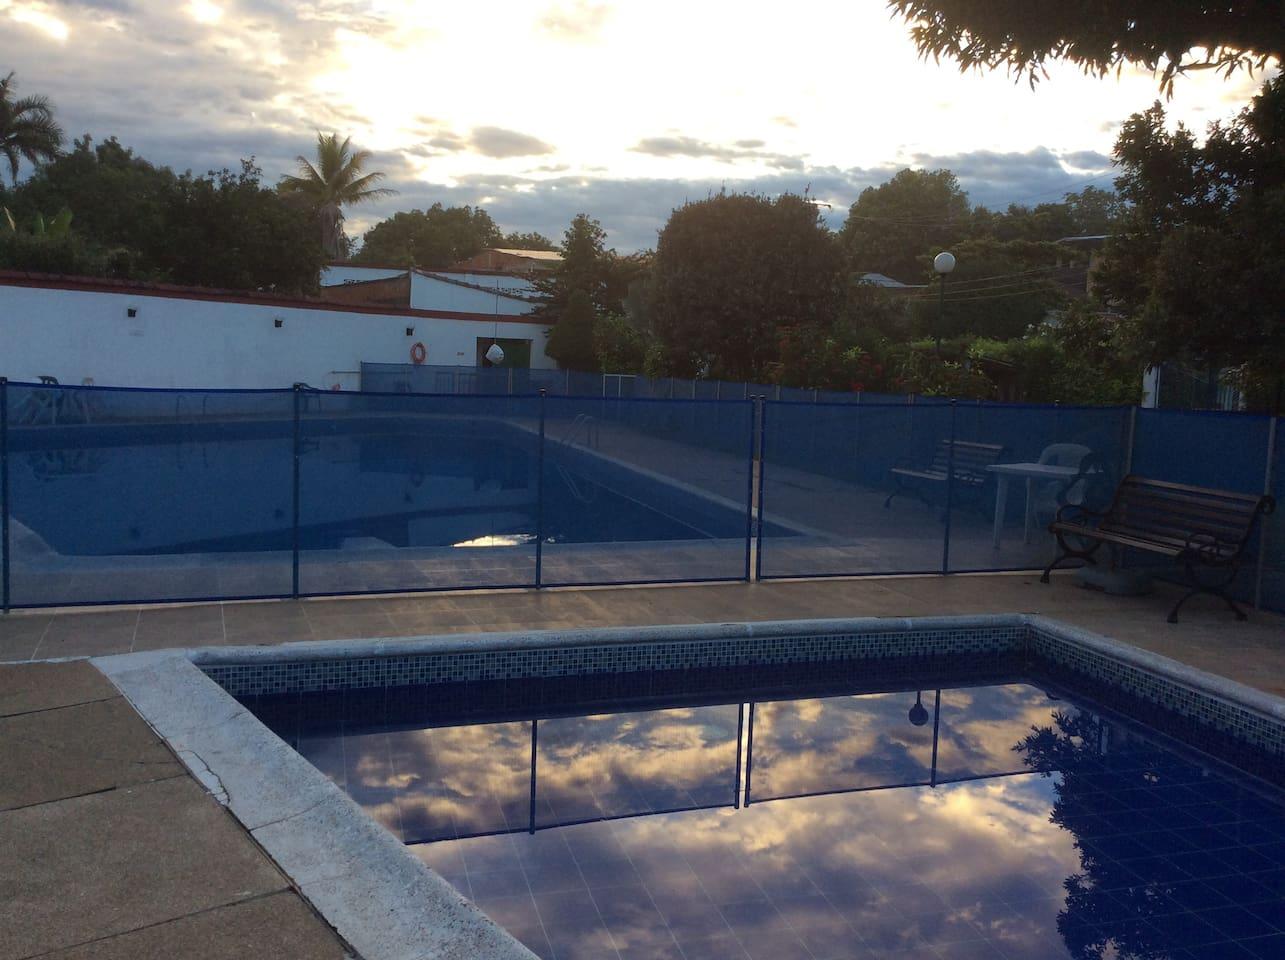 Hotel Villa Chela Carmen de Apicala . ubicación privilegiada para un grato descanso familiar.